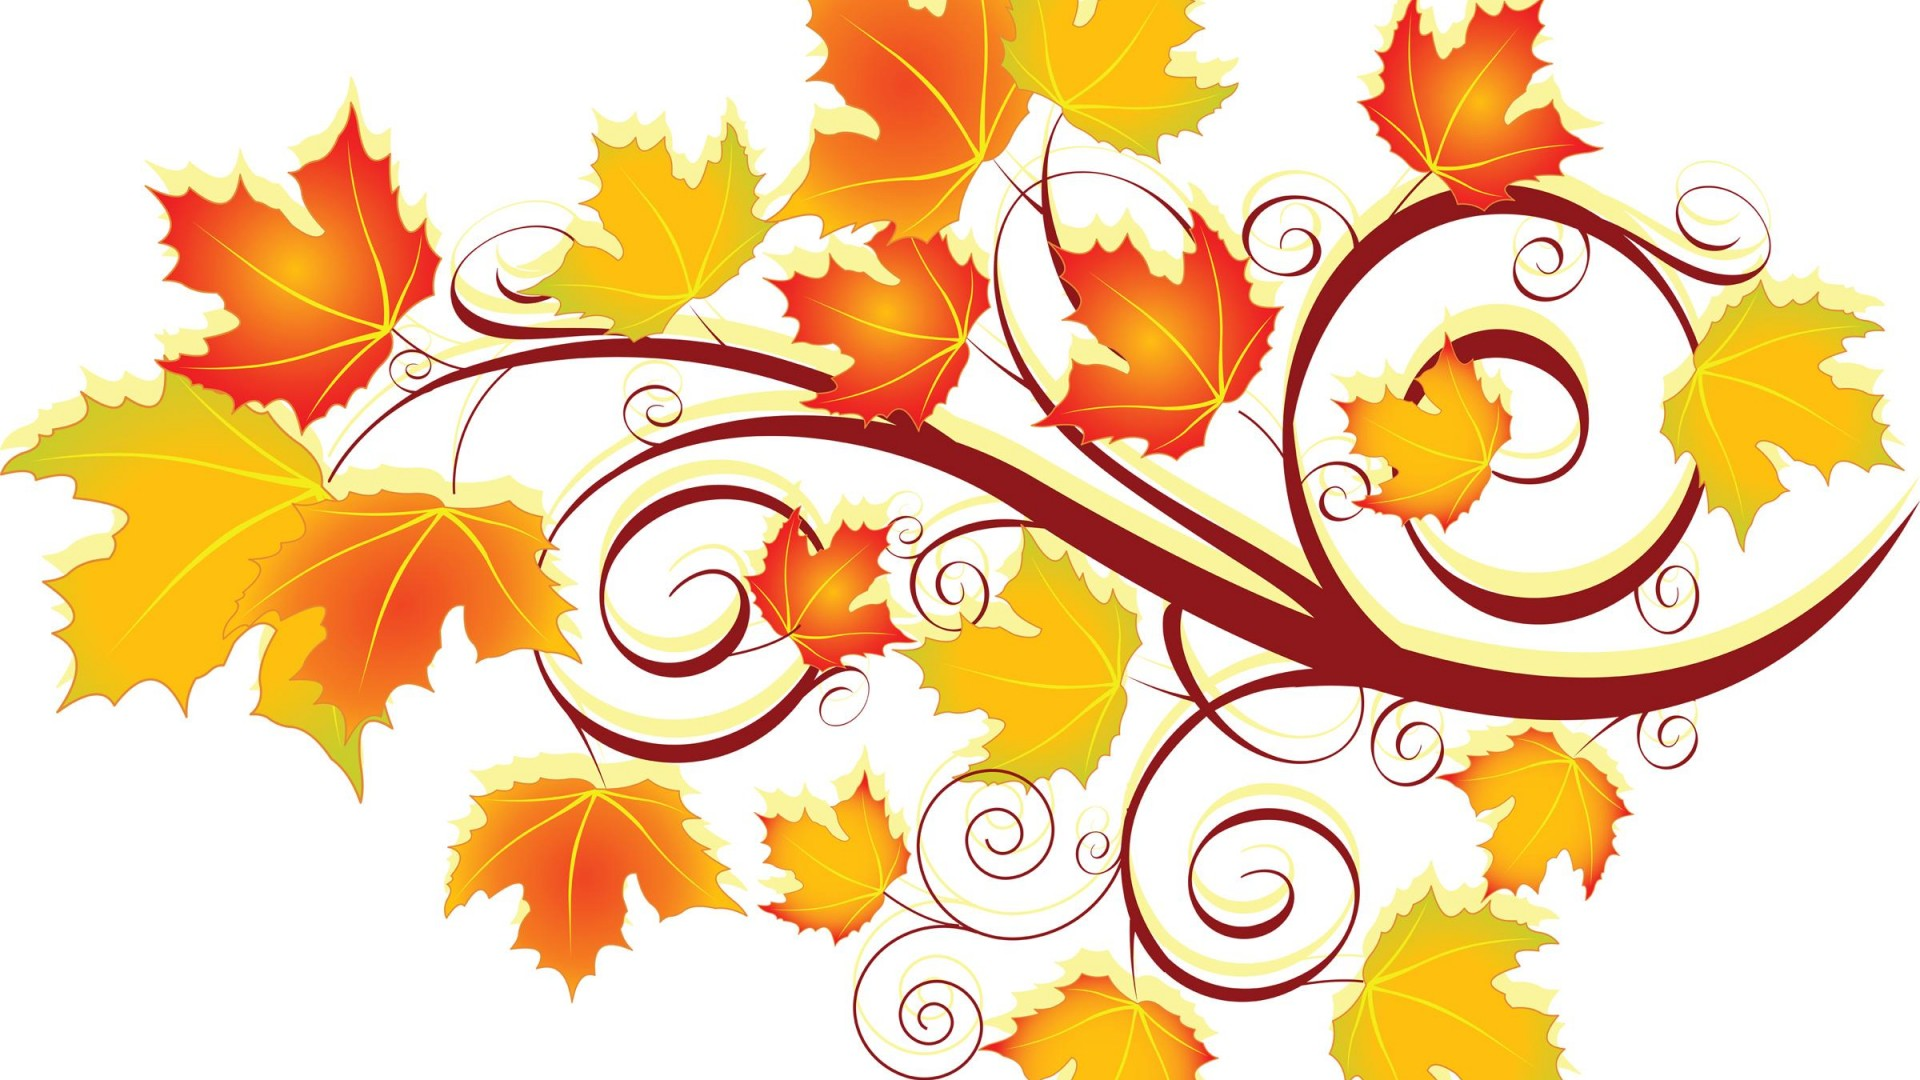 Leaves Desktop Wallpaper 03523.